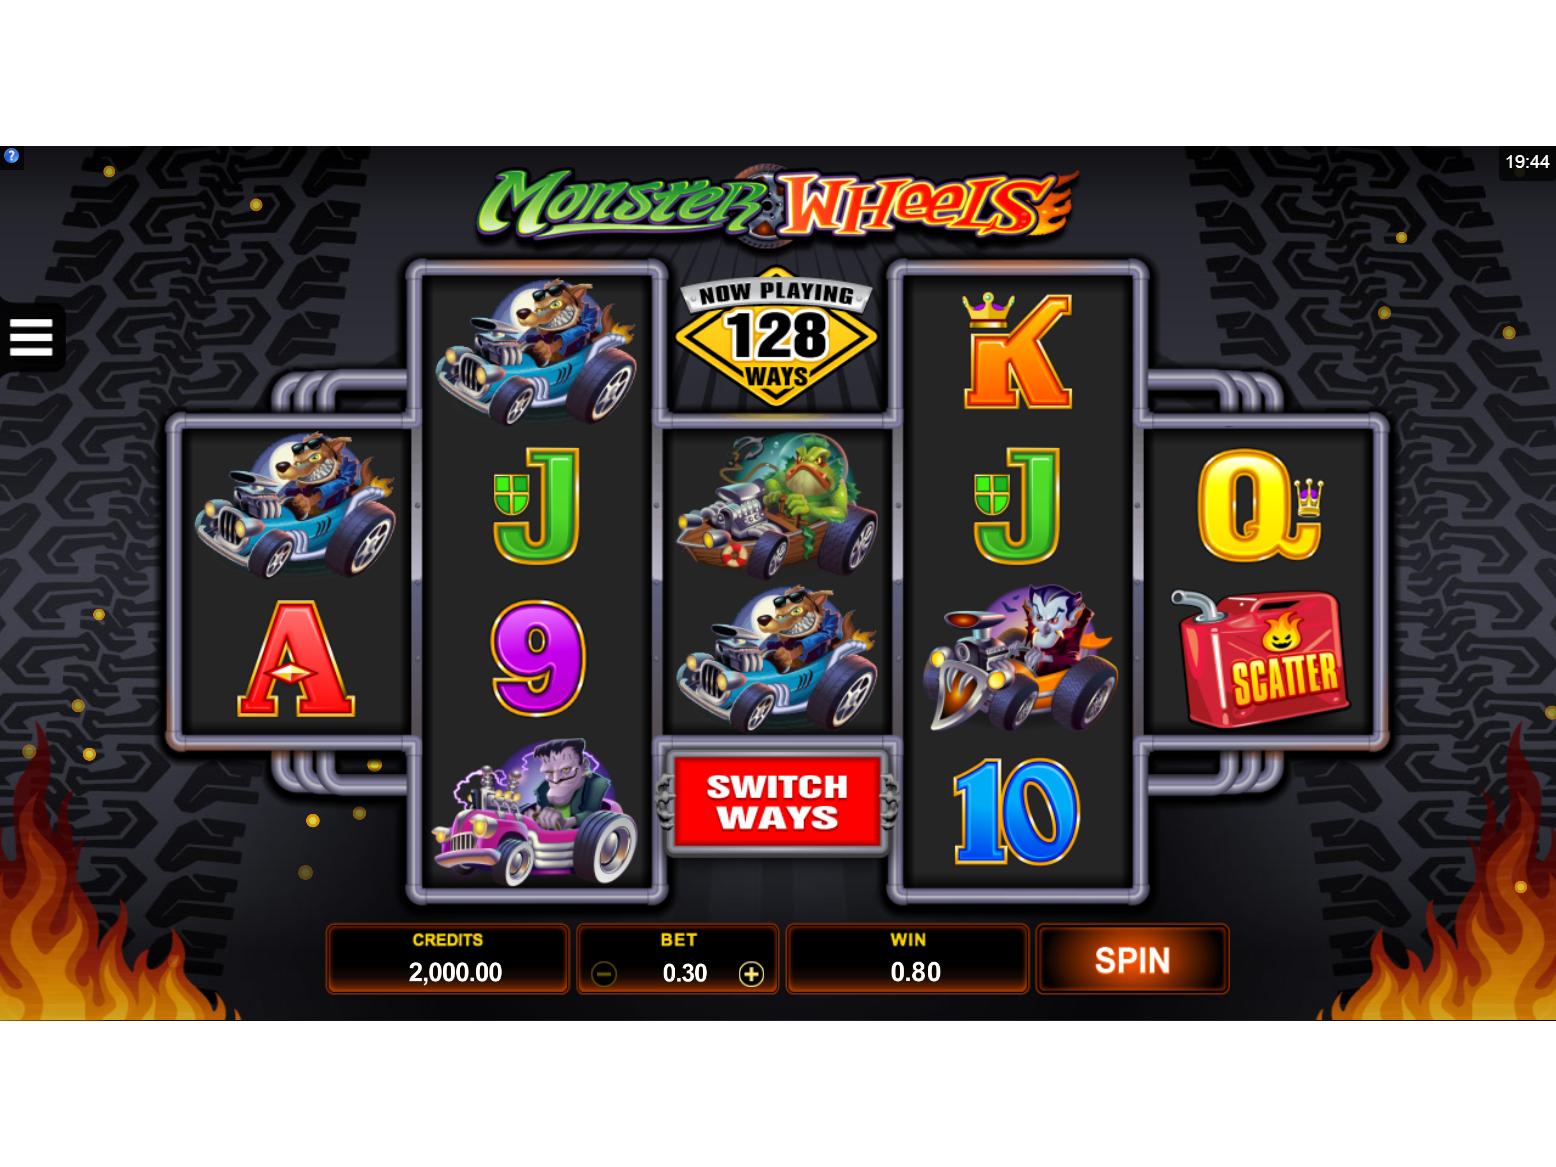 Jugar 300 Shields tragamonedas sorteos gratis 2019-492166